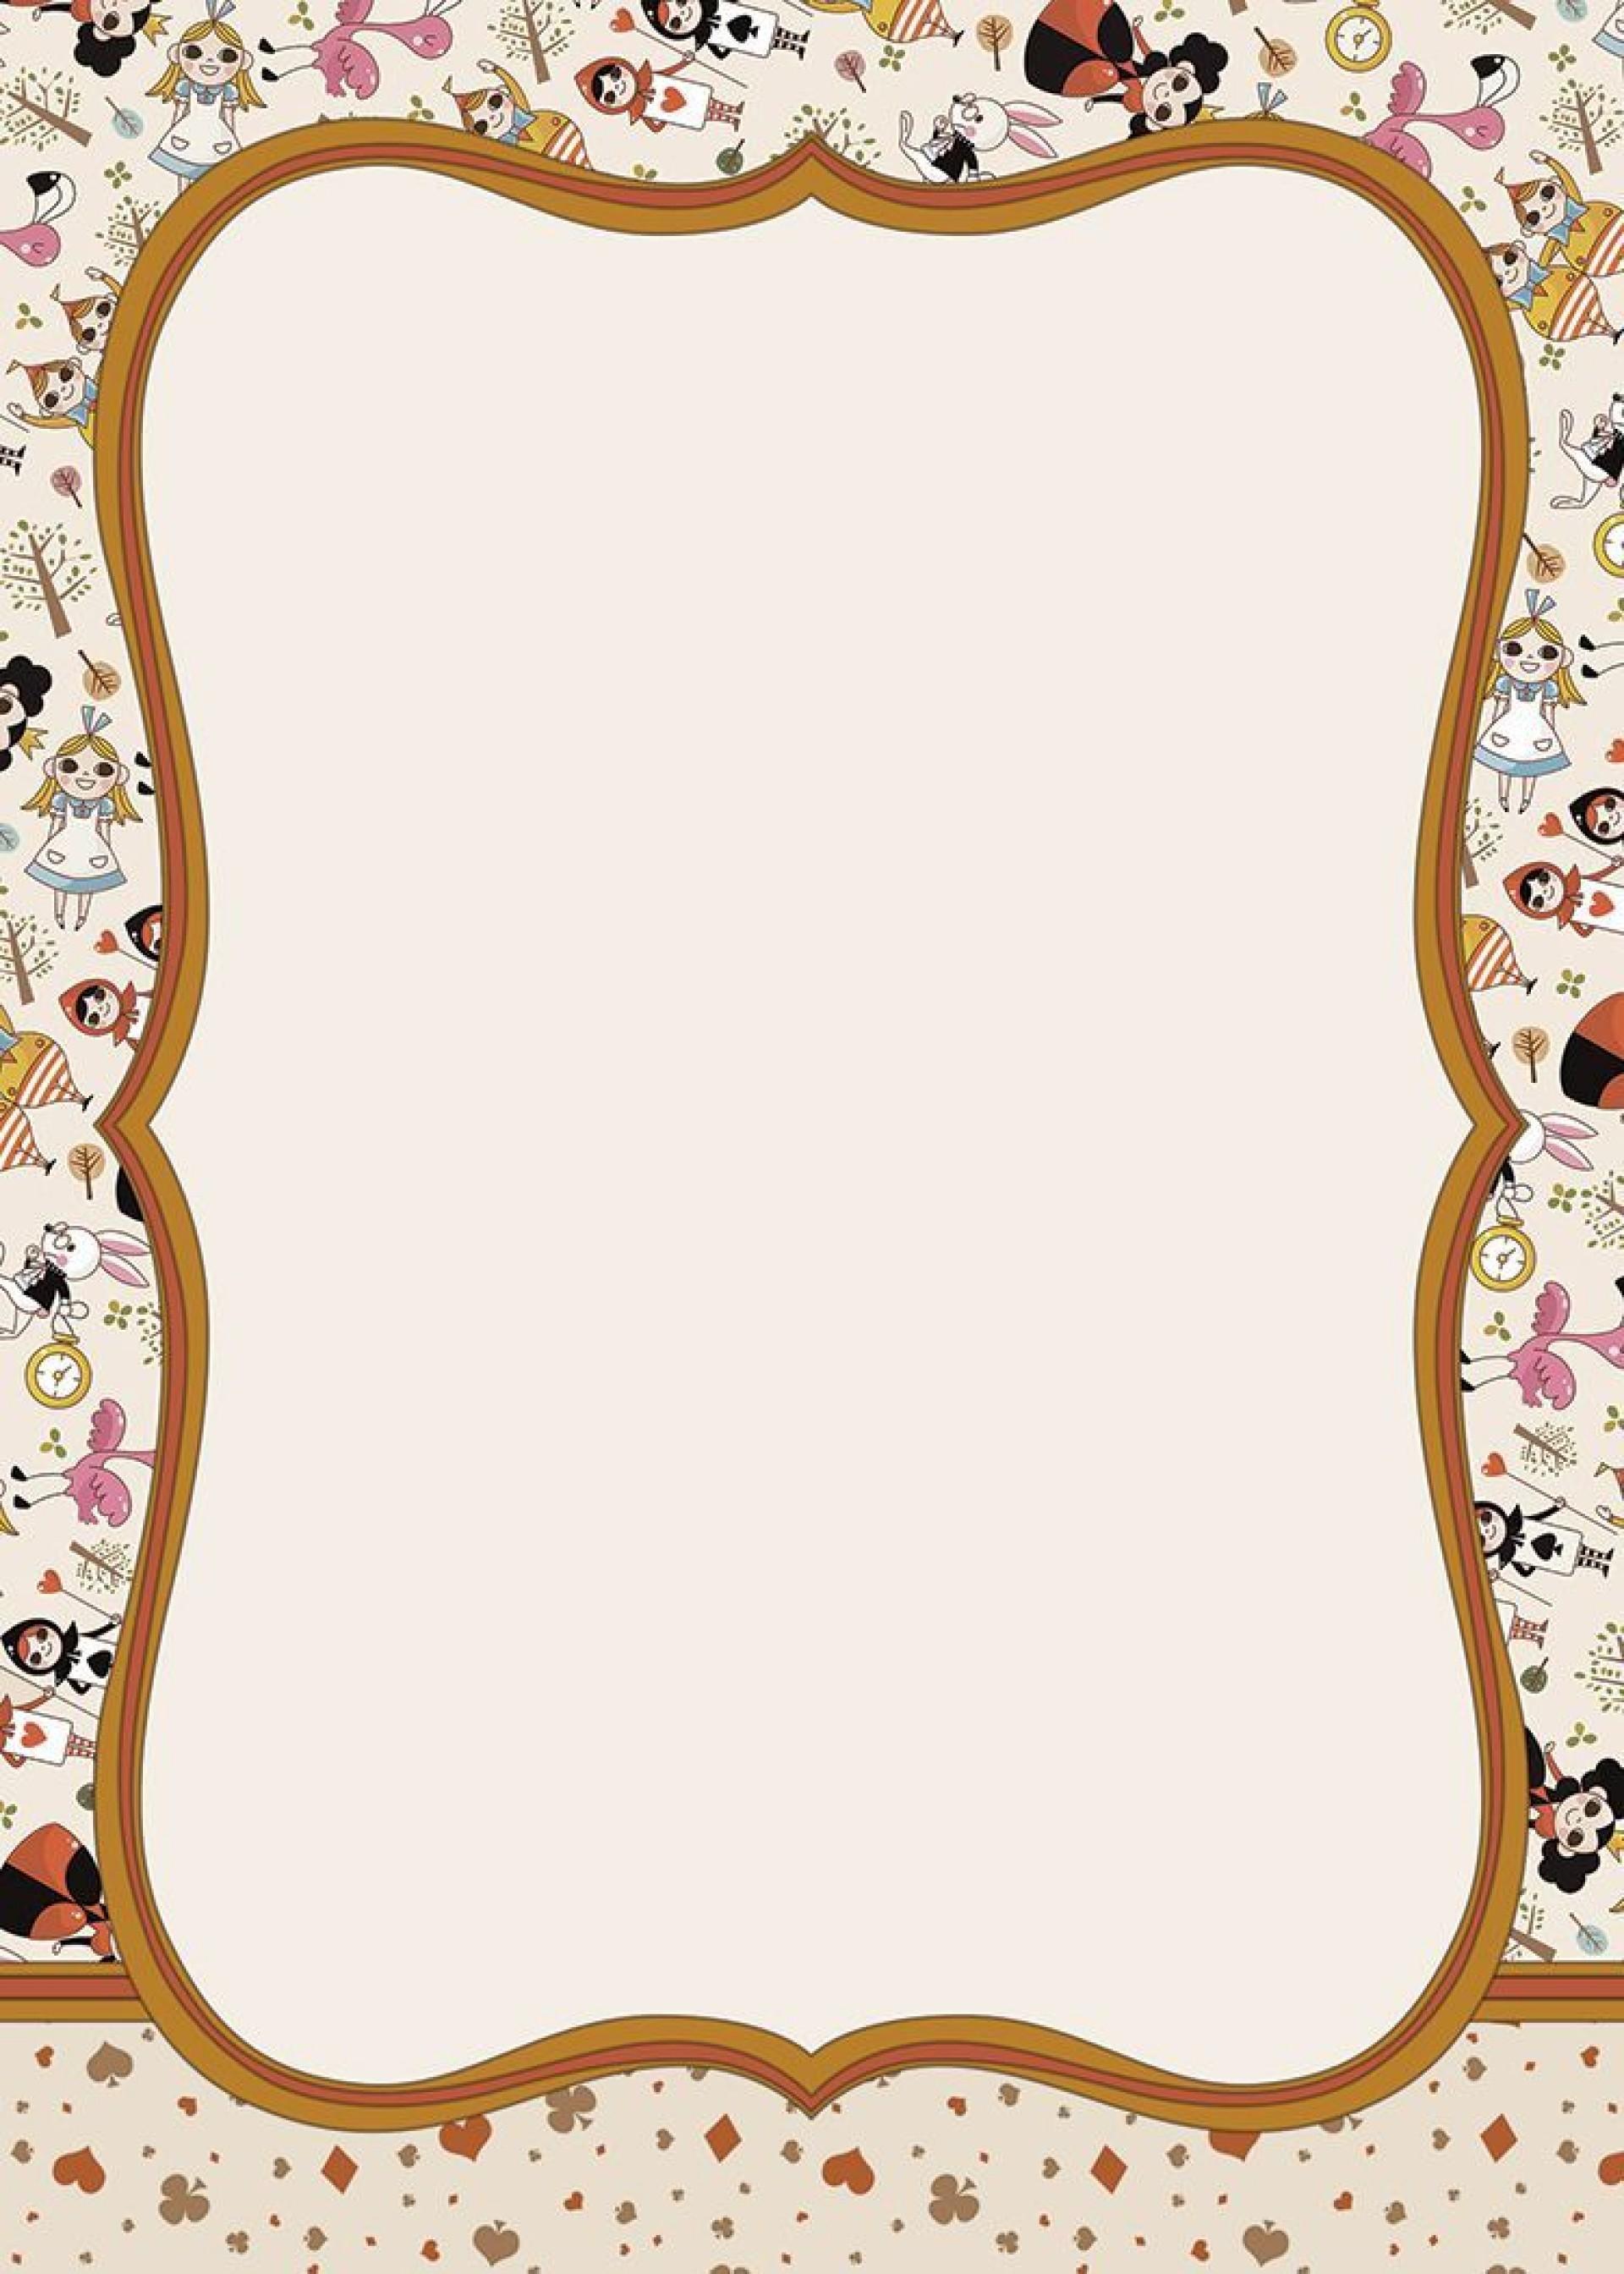 000 Unforgettable Alice In Wonderland Invitation Template High Definition  Templates Wedding Birthday Free Tea Party1920